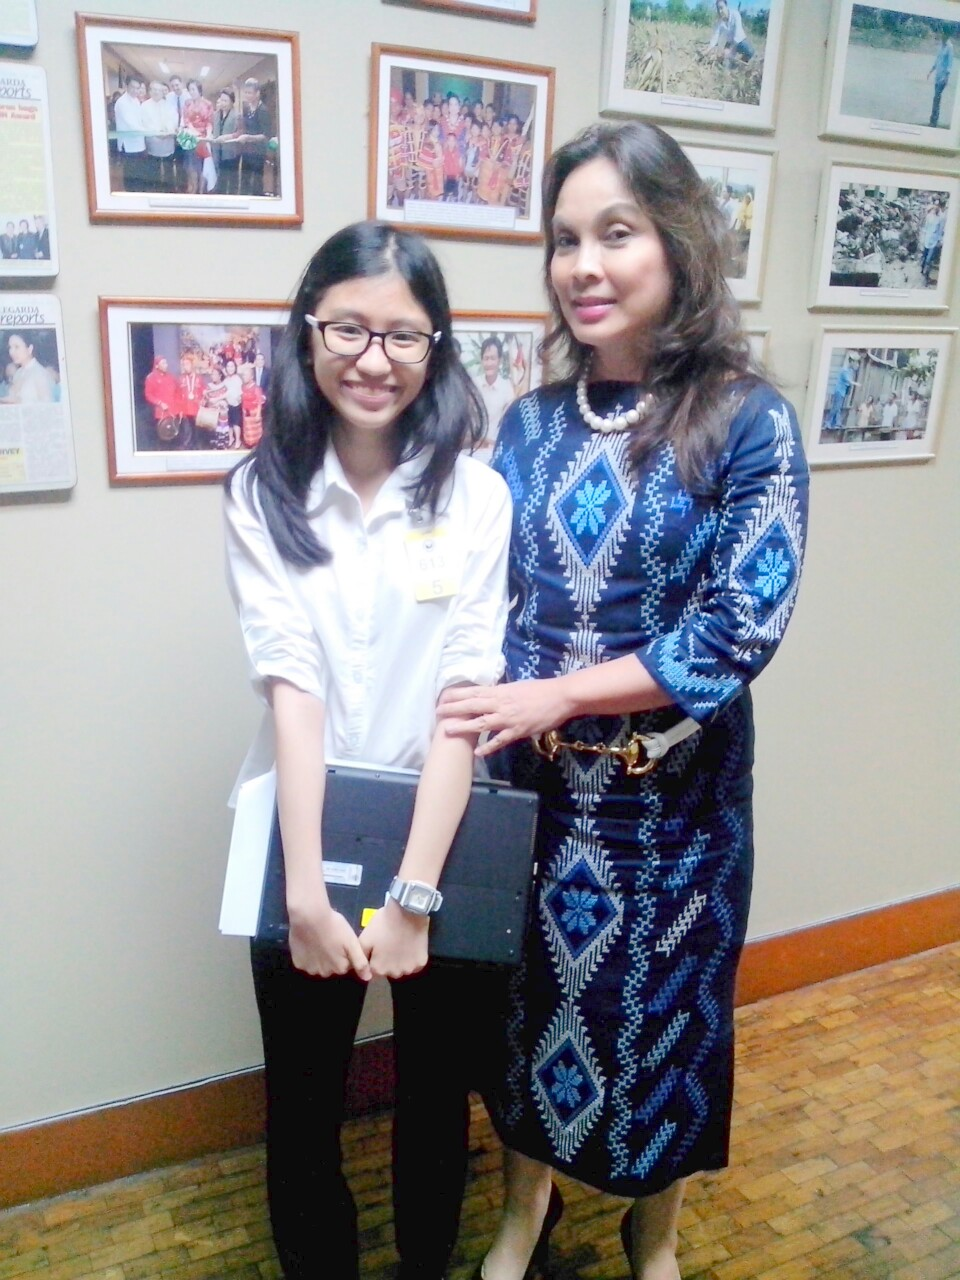 Intern Annicka Koteh with Senator Loren Legarda